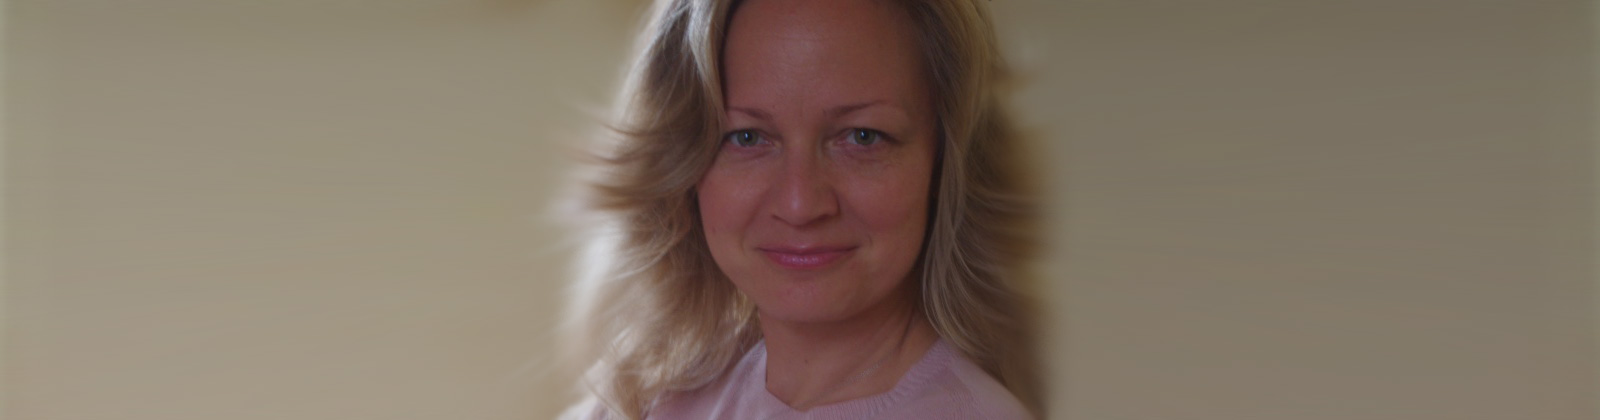 Krisztina Fekecs Assistente Virtuale